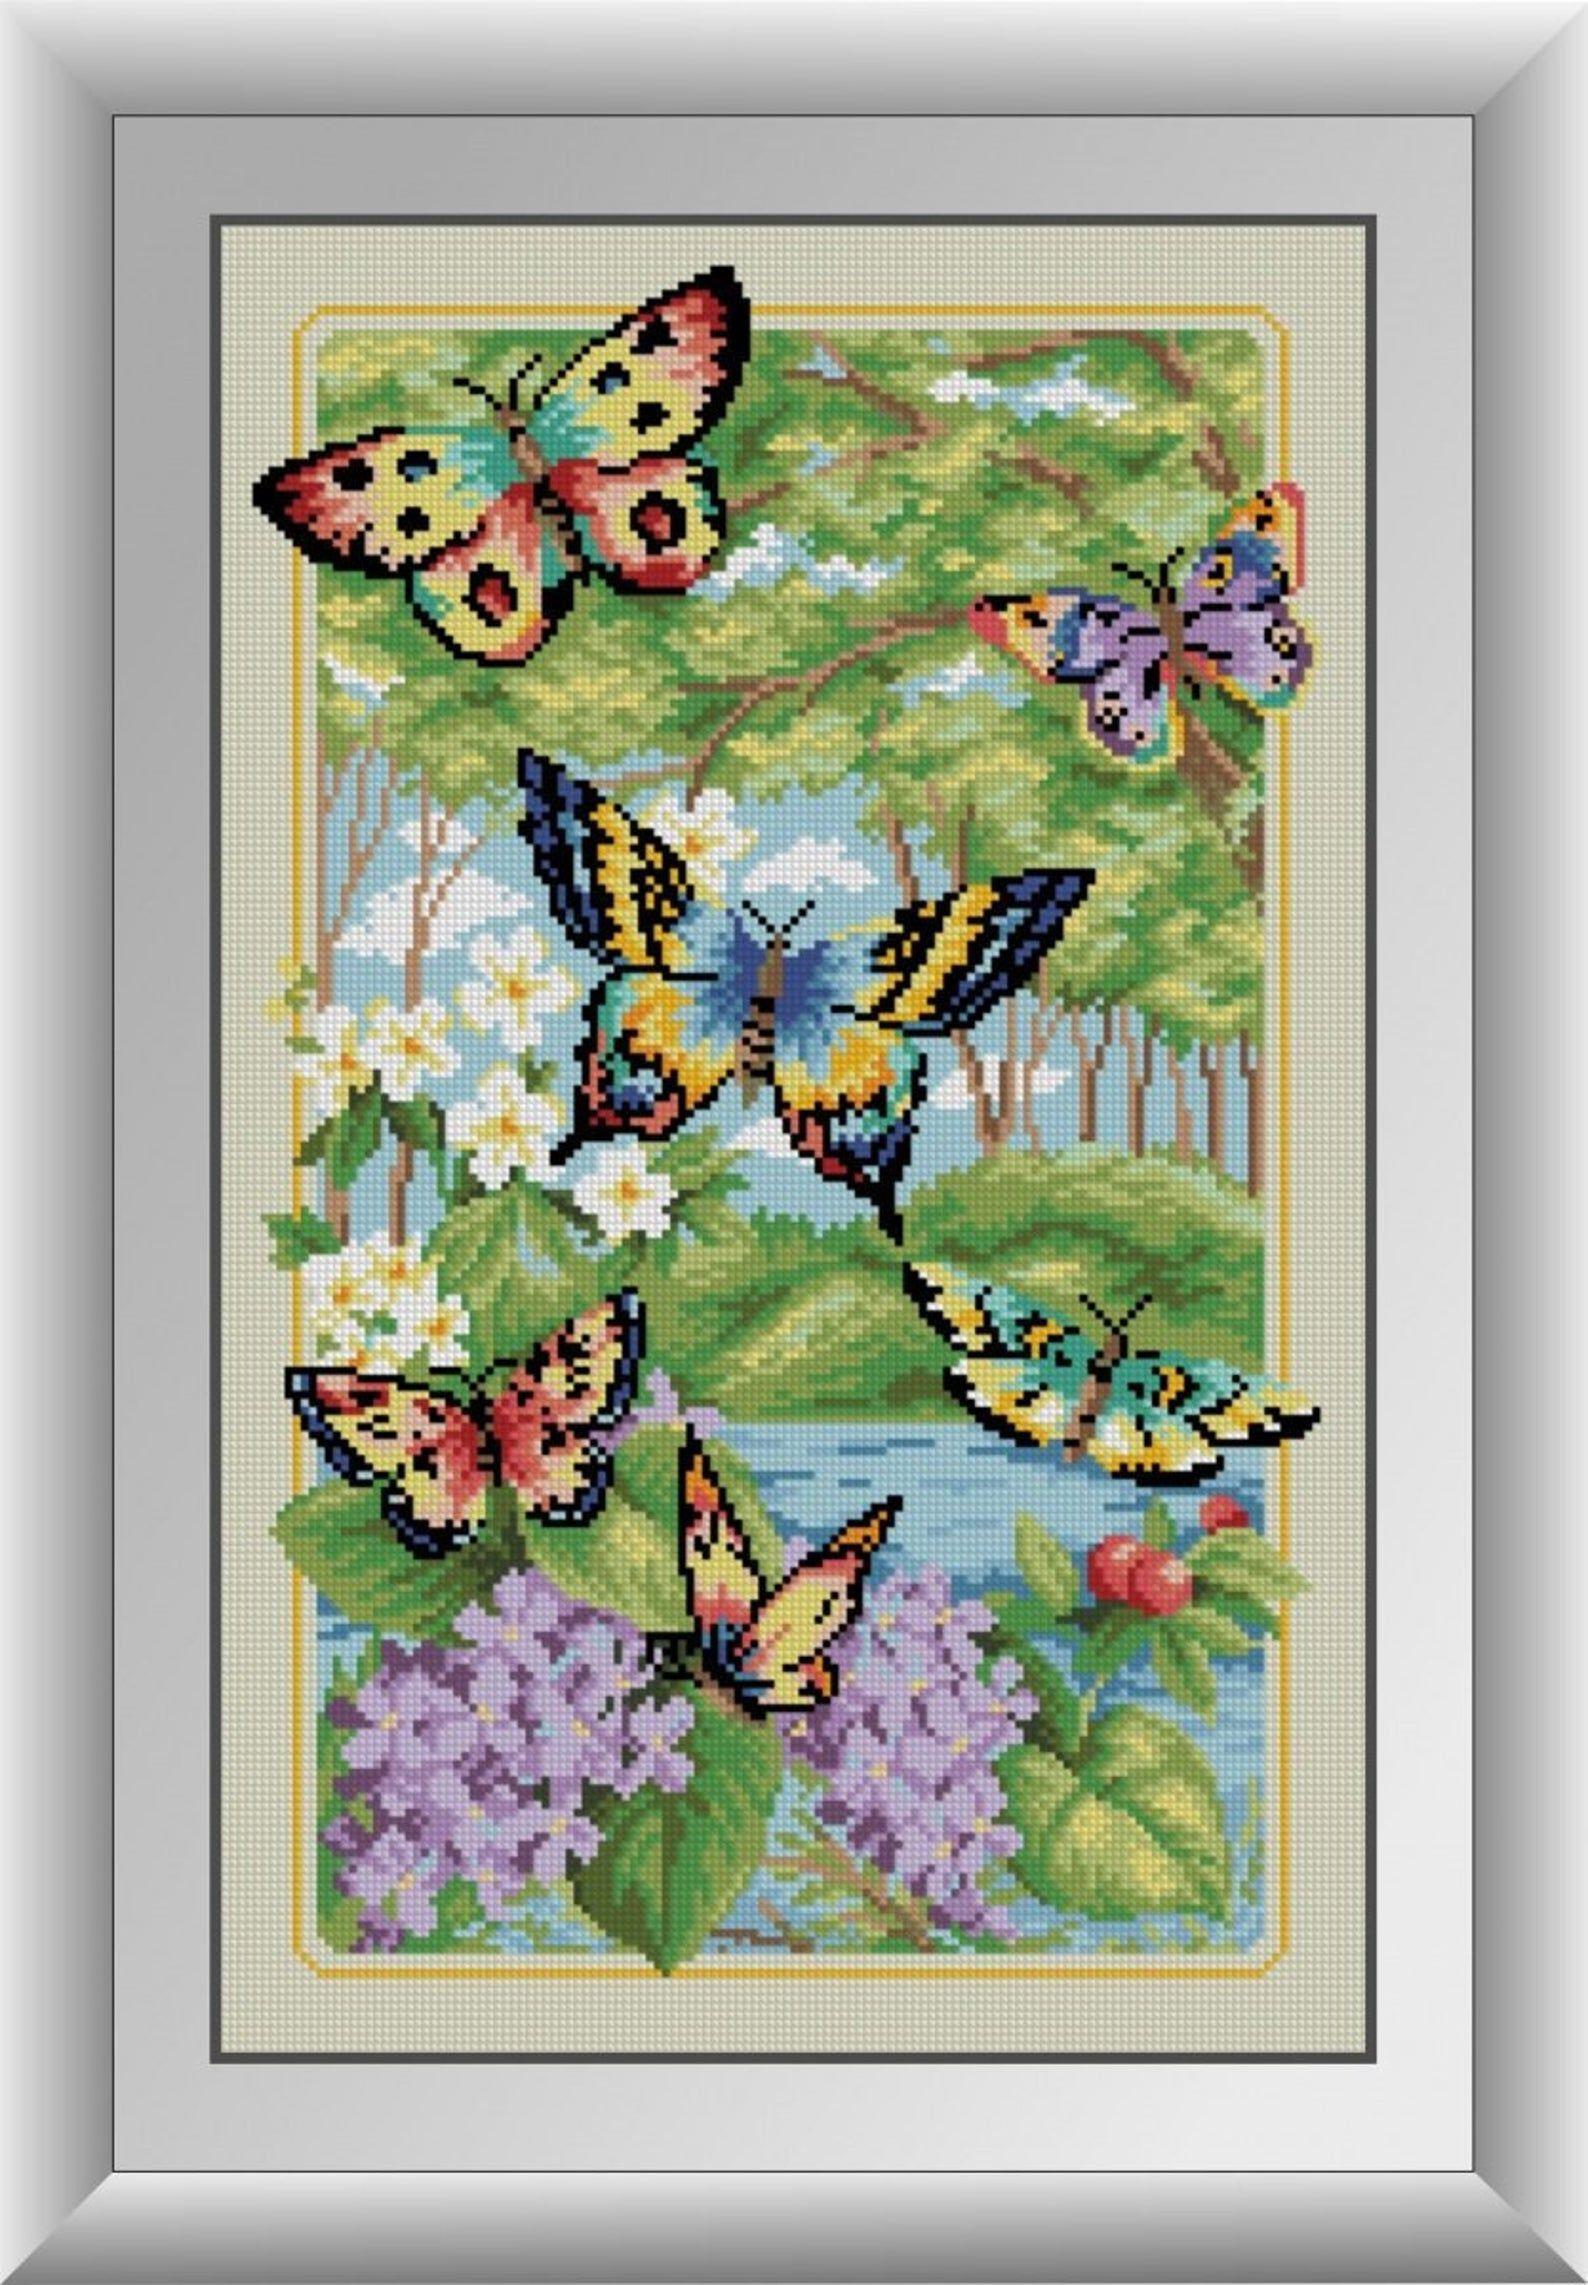 Butterflies diy diamond painting kit full square drill